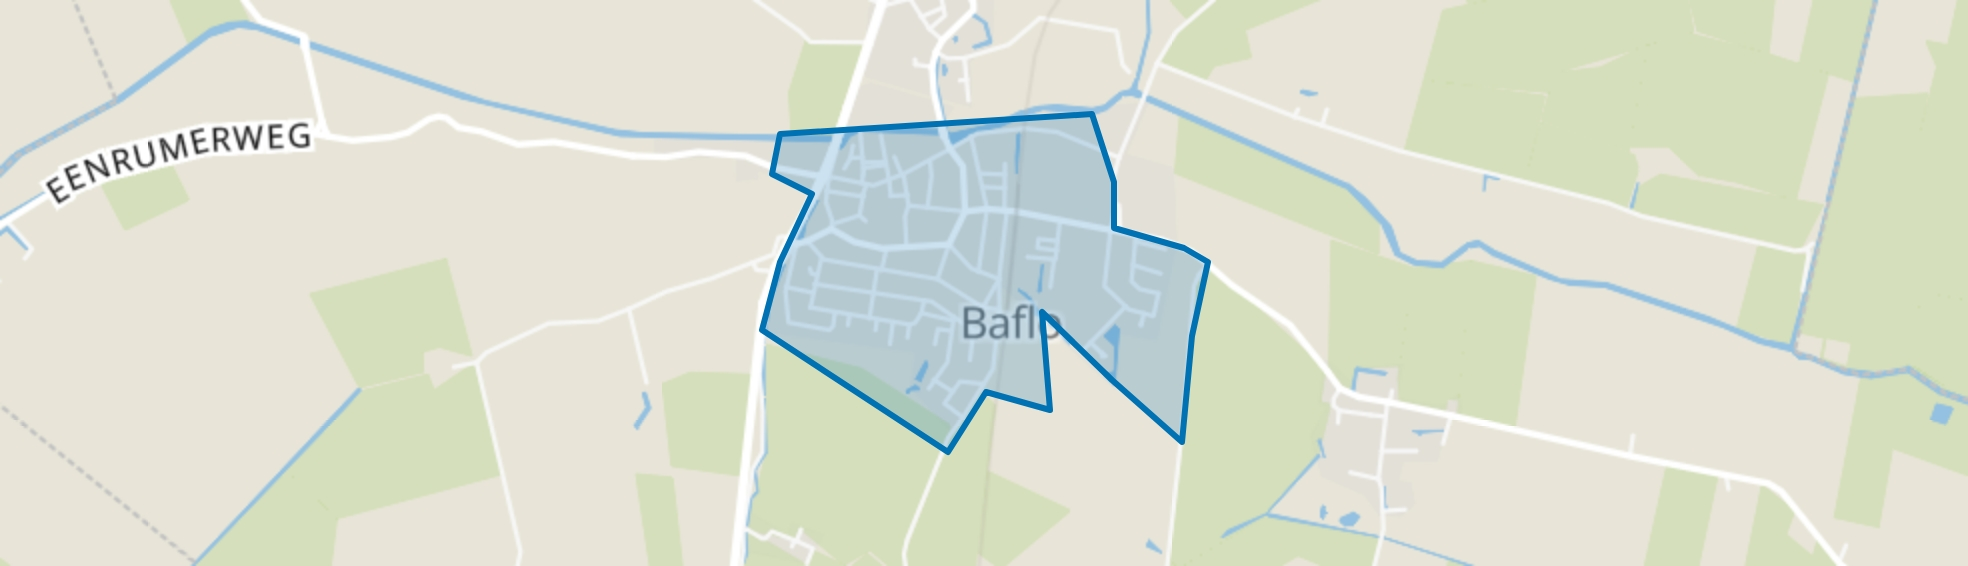 Baflo, Baflo map